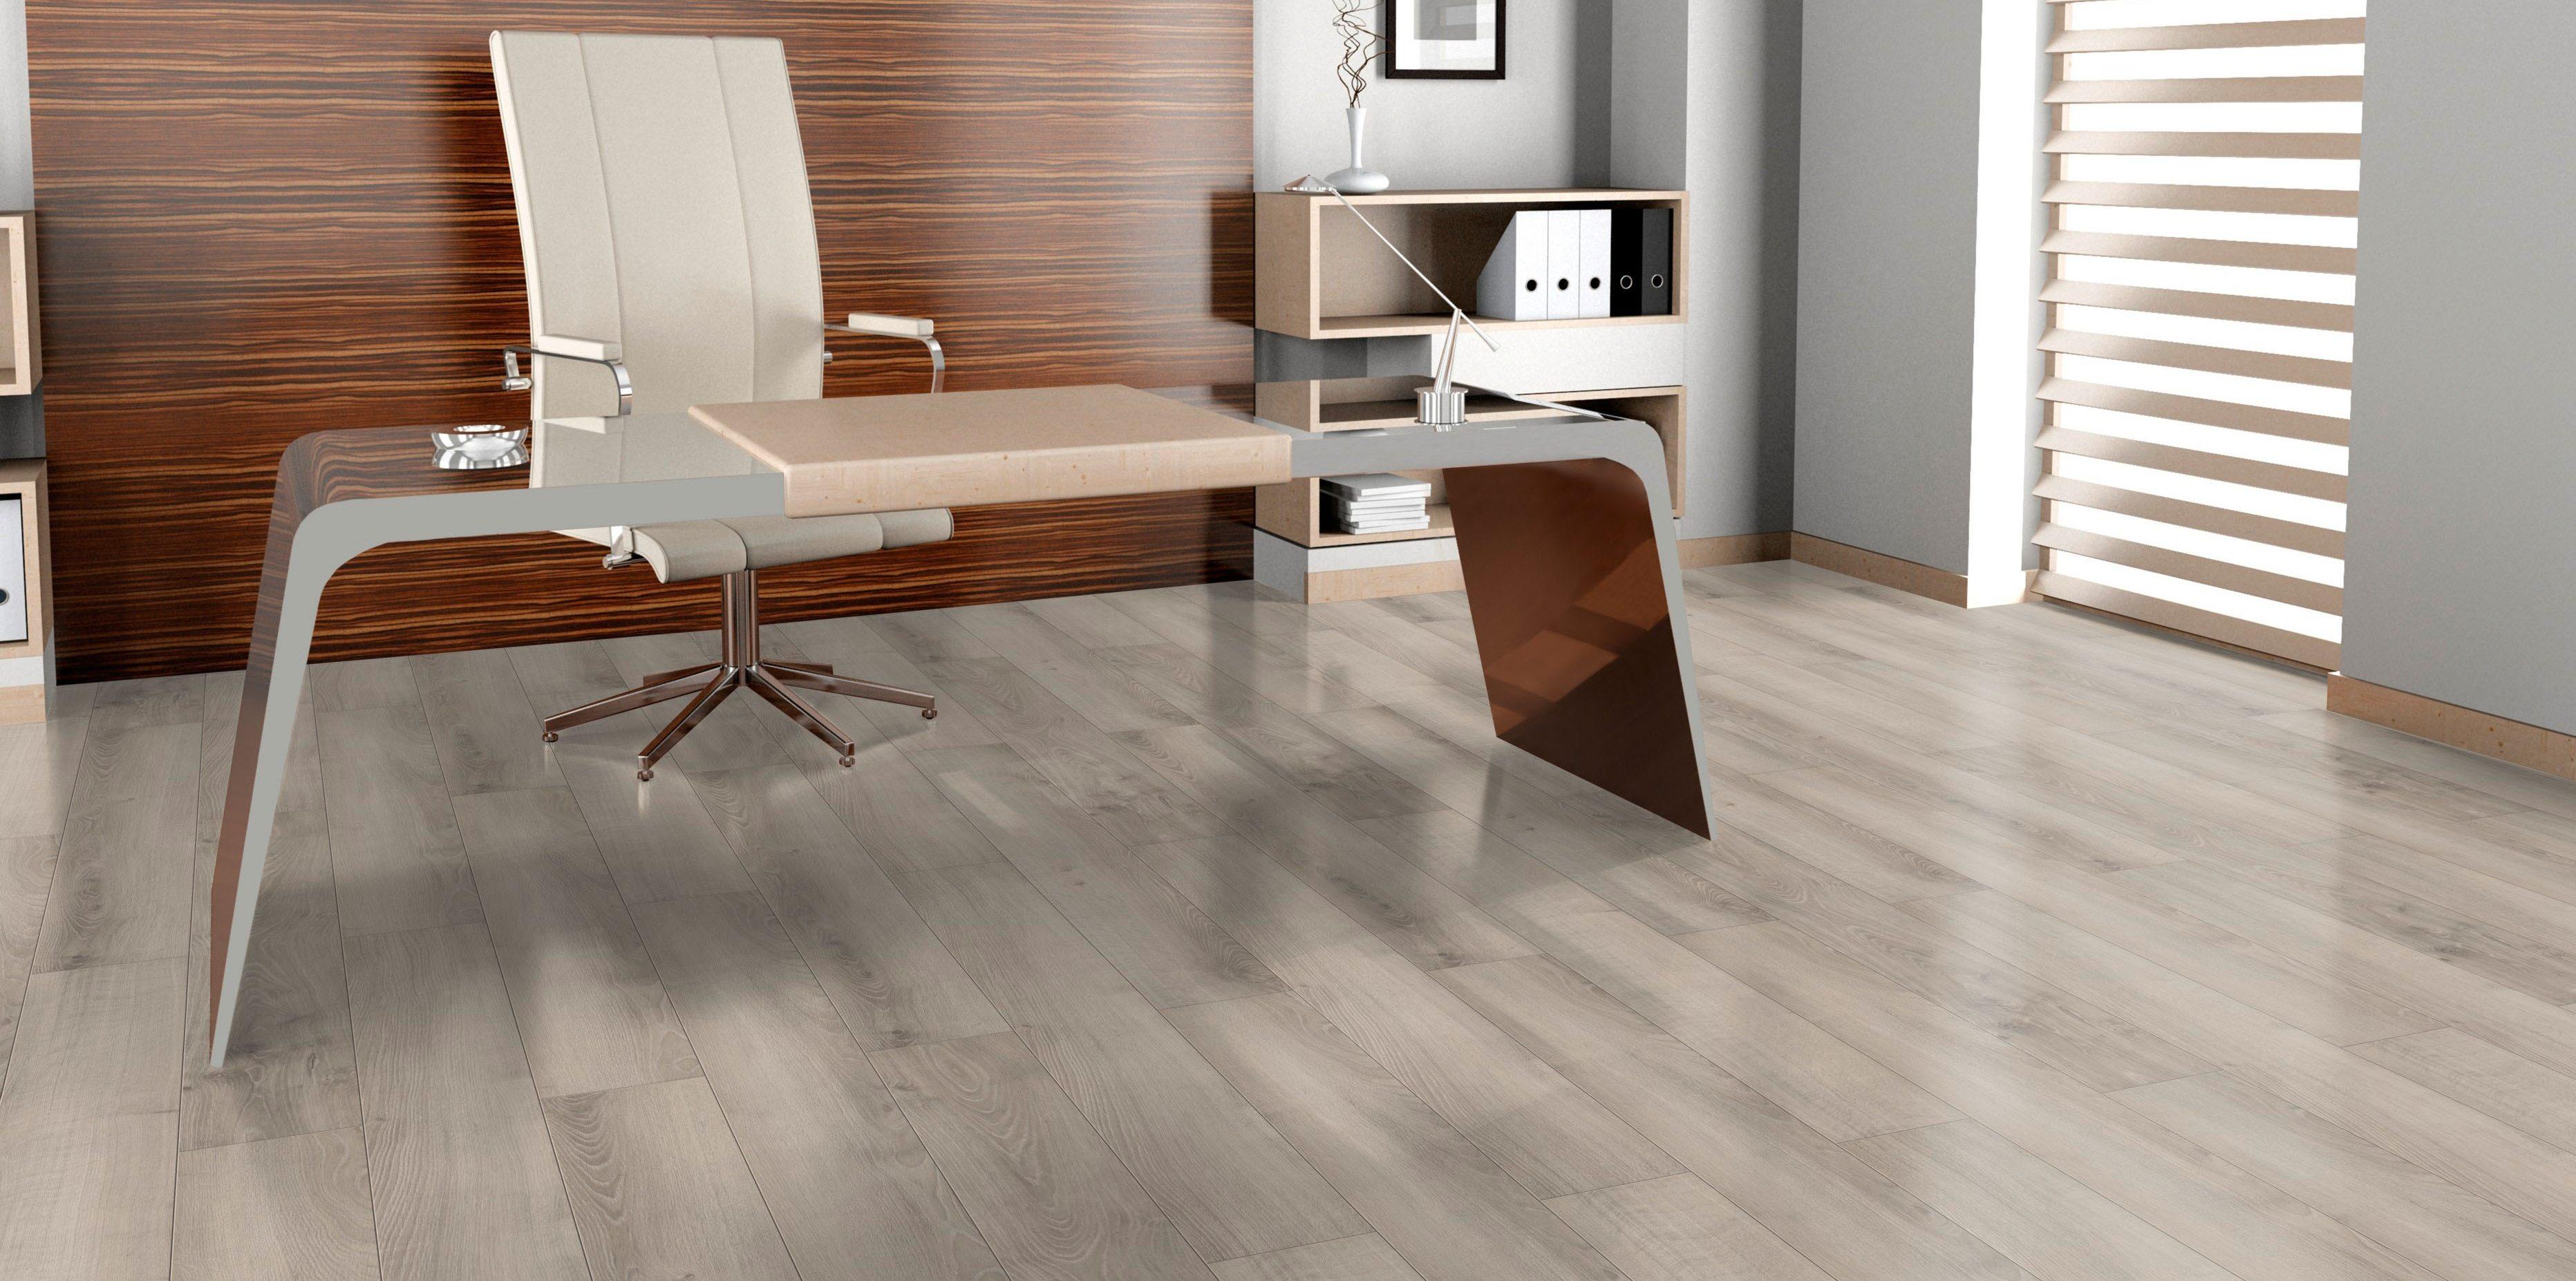 madera para suelos